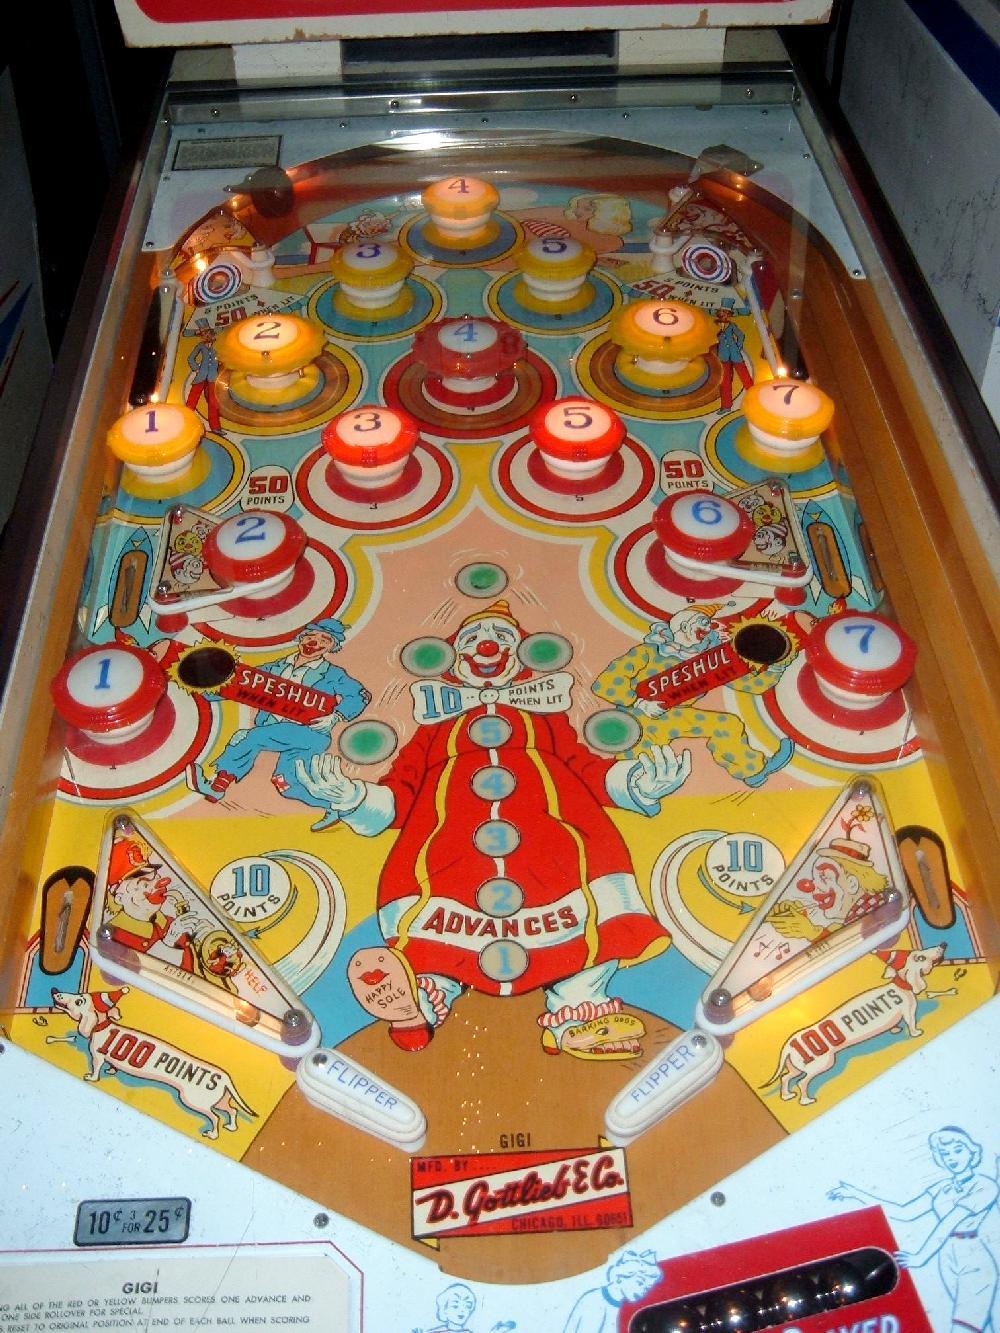 gottlieb gigi pinball gottlieb 1963 machine